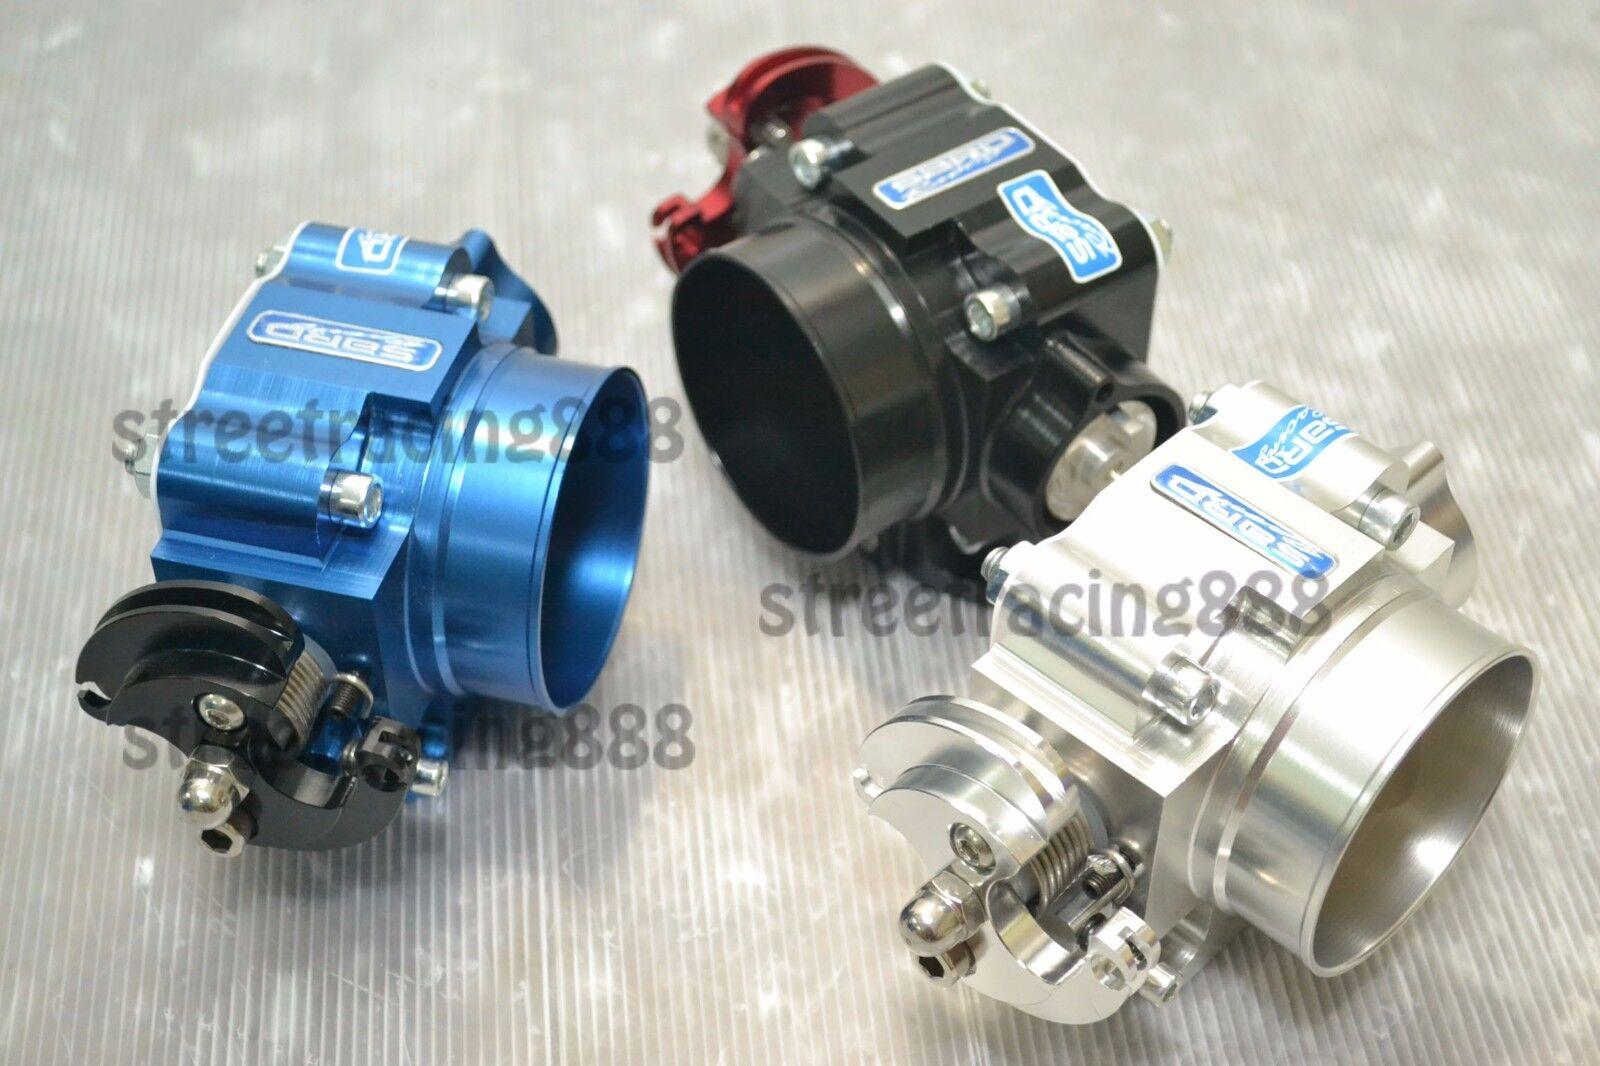 Pro S90 Racing Throttle Body 70mm Mitsubishi 4G91 4G92 Mivec 4G93 4G93T GSR Dohc